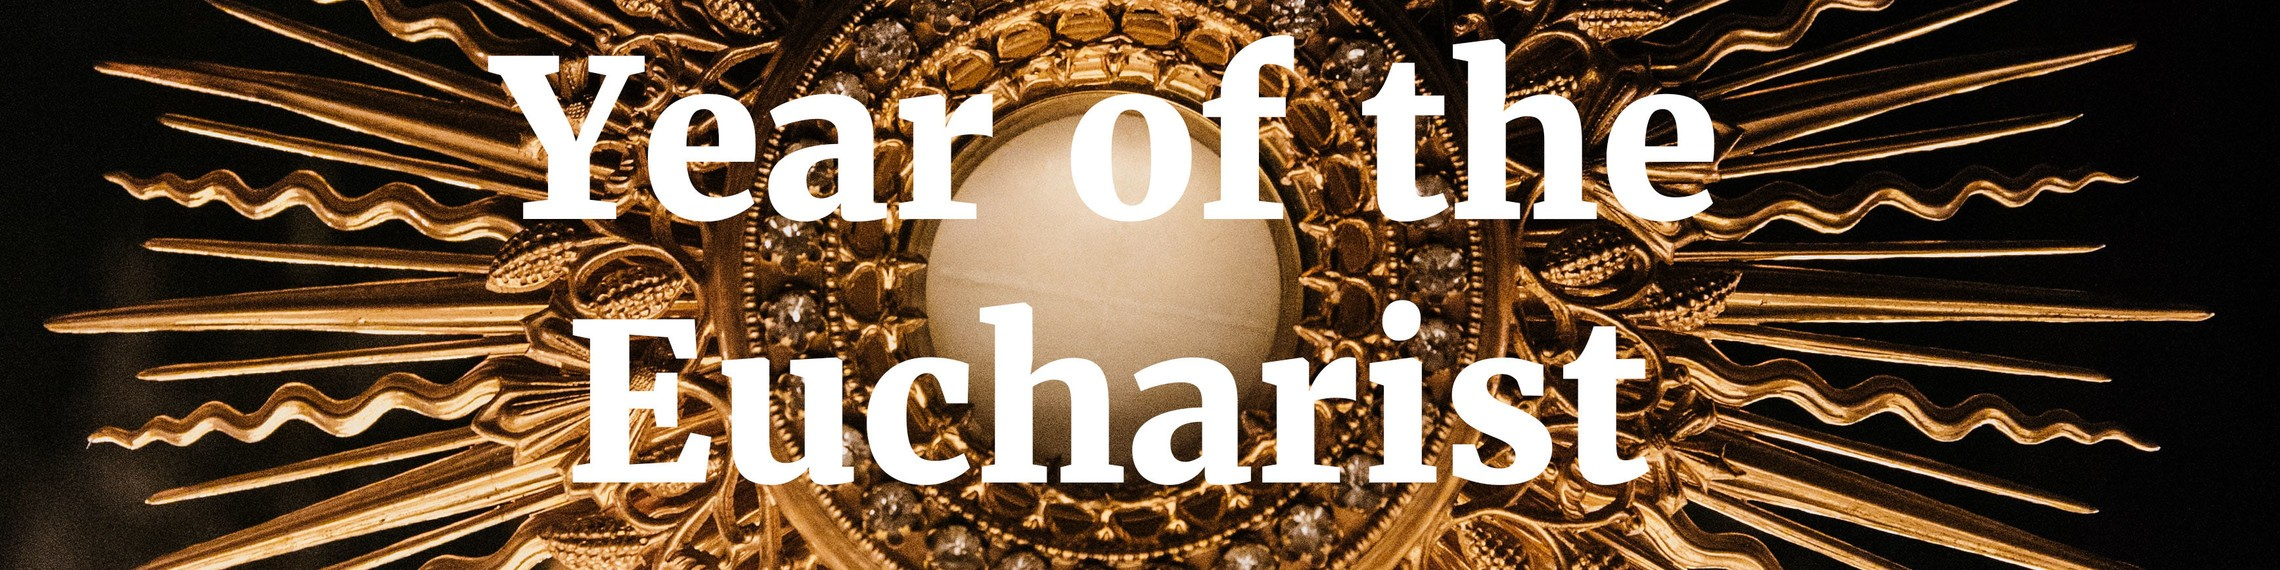 Year Of The Eucharist